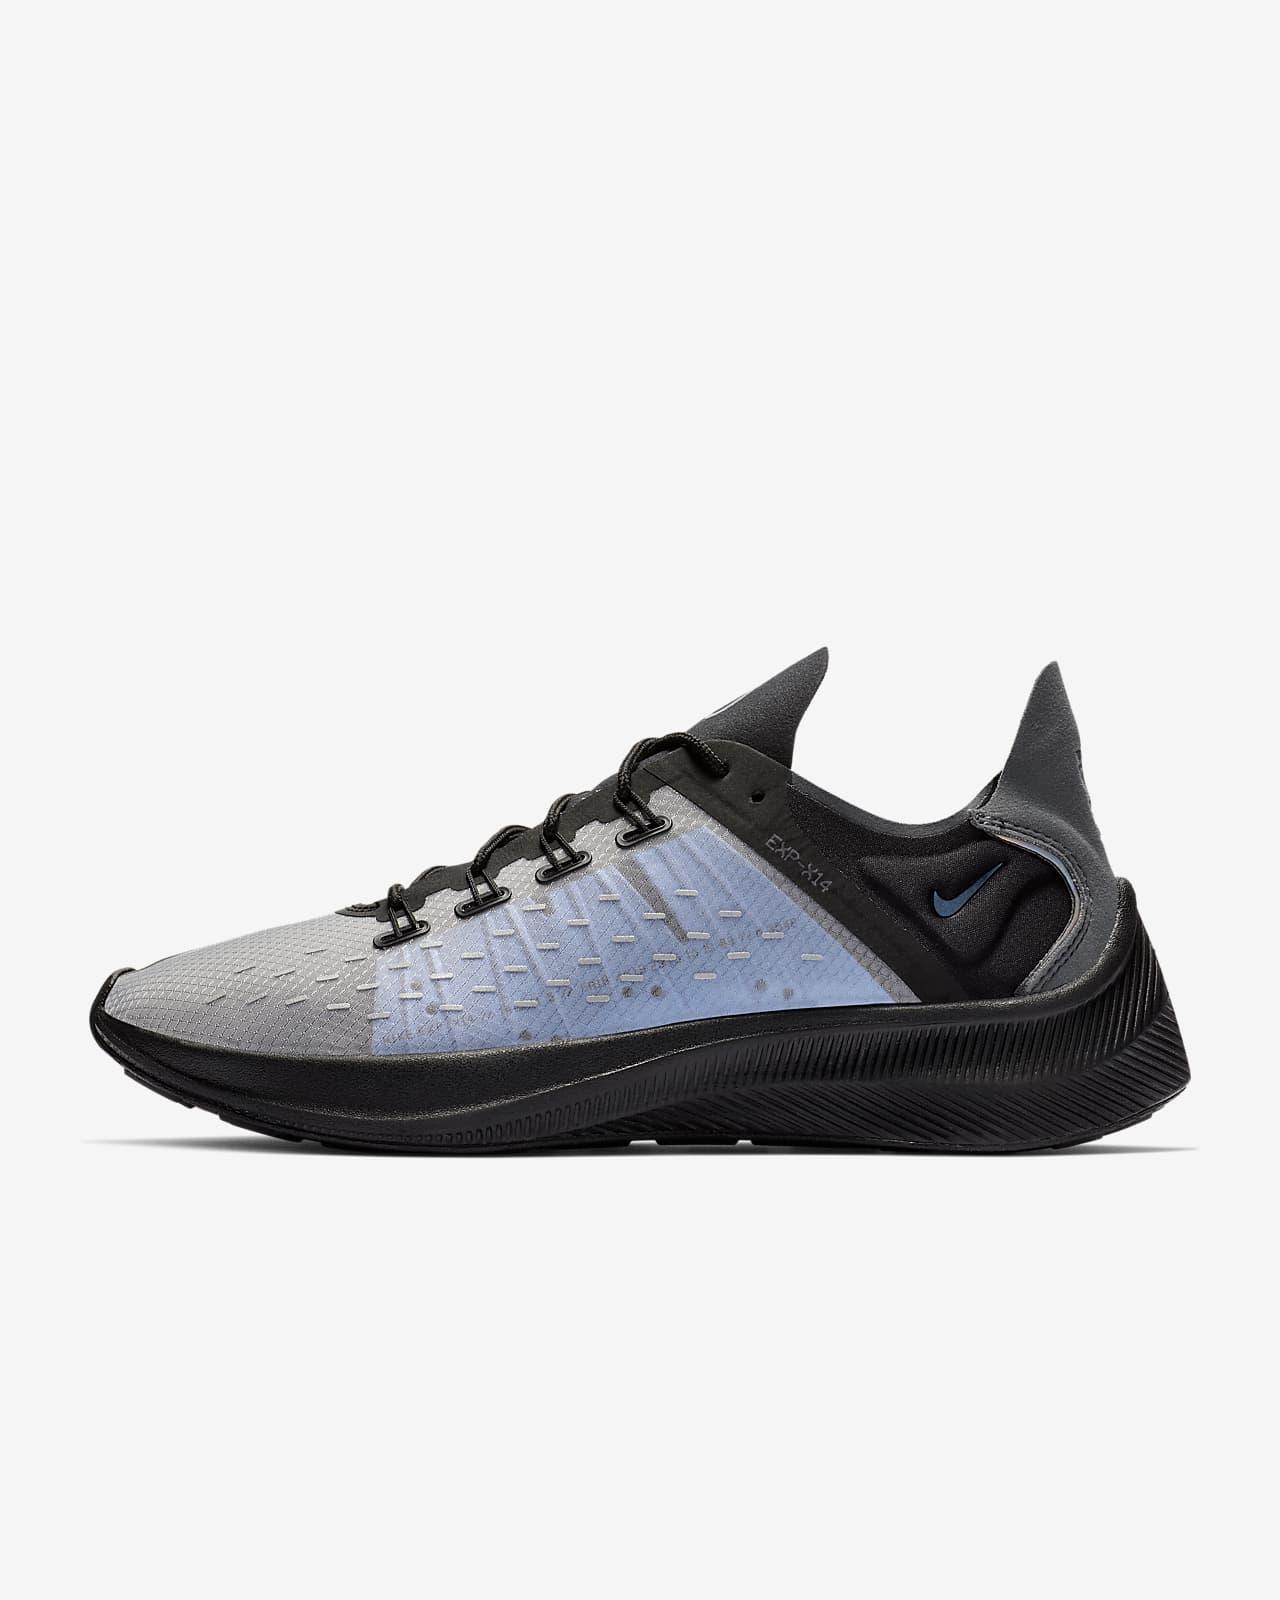 Nike EXP-X14 Y2K Men's Shoe. Nike SG